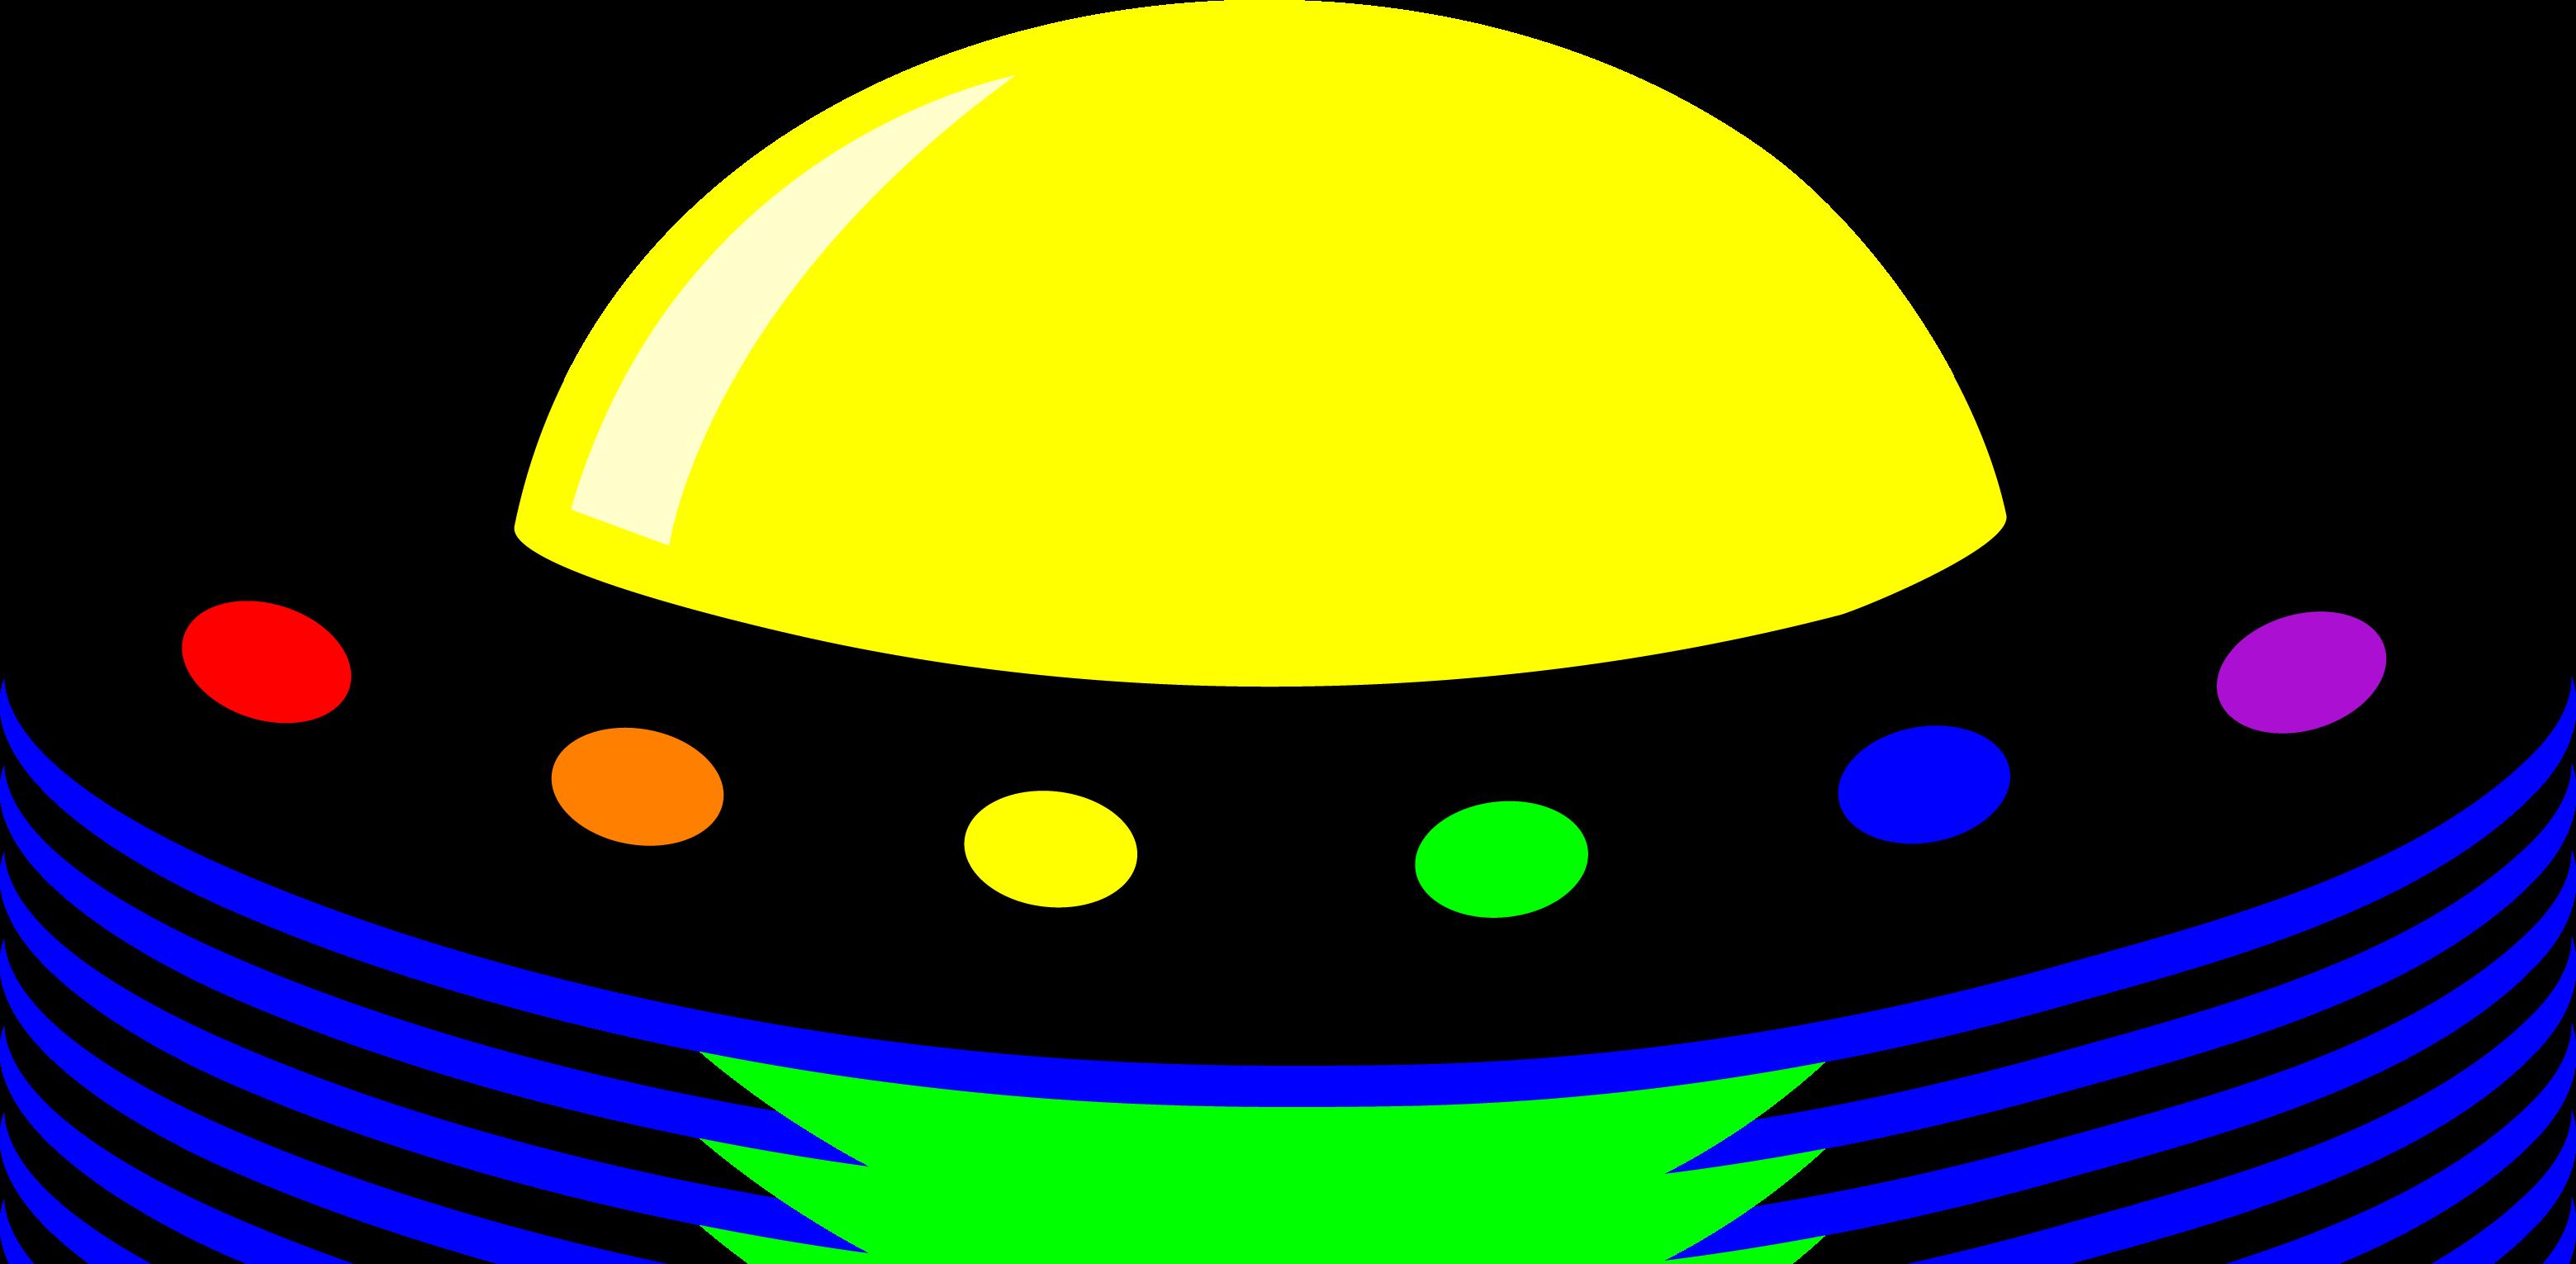 freeuse Ufo Spaceship Clipart